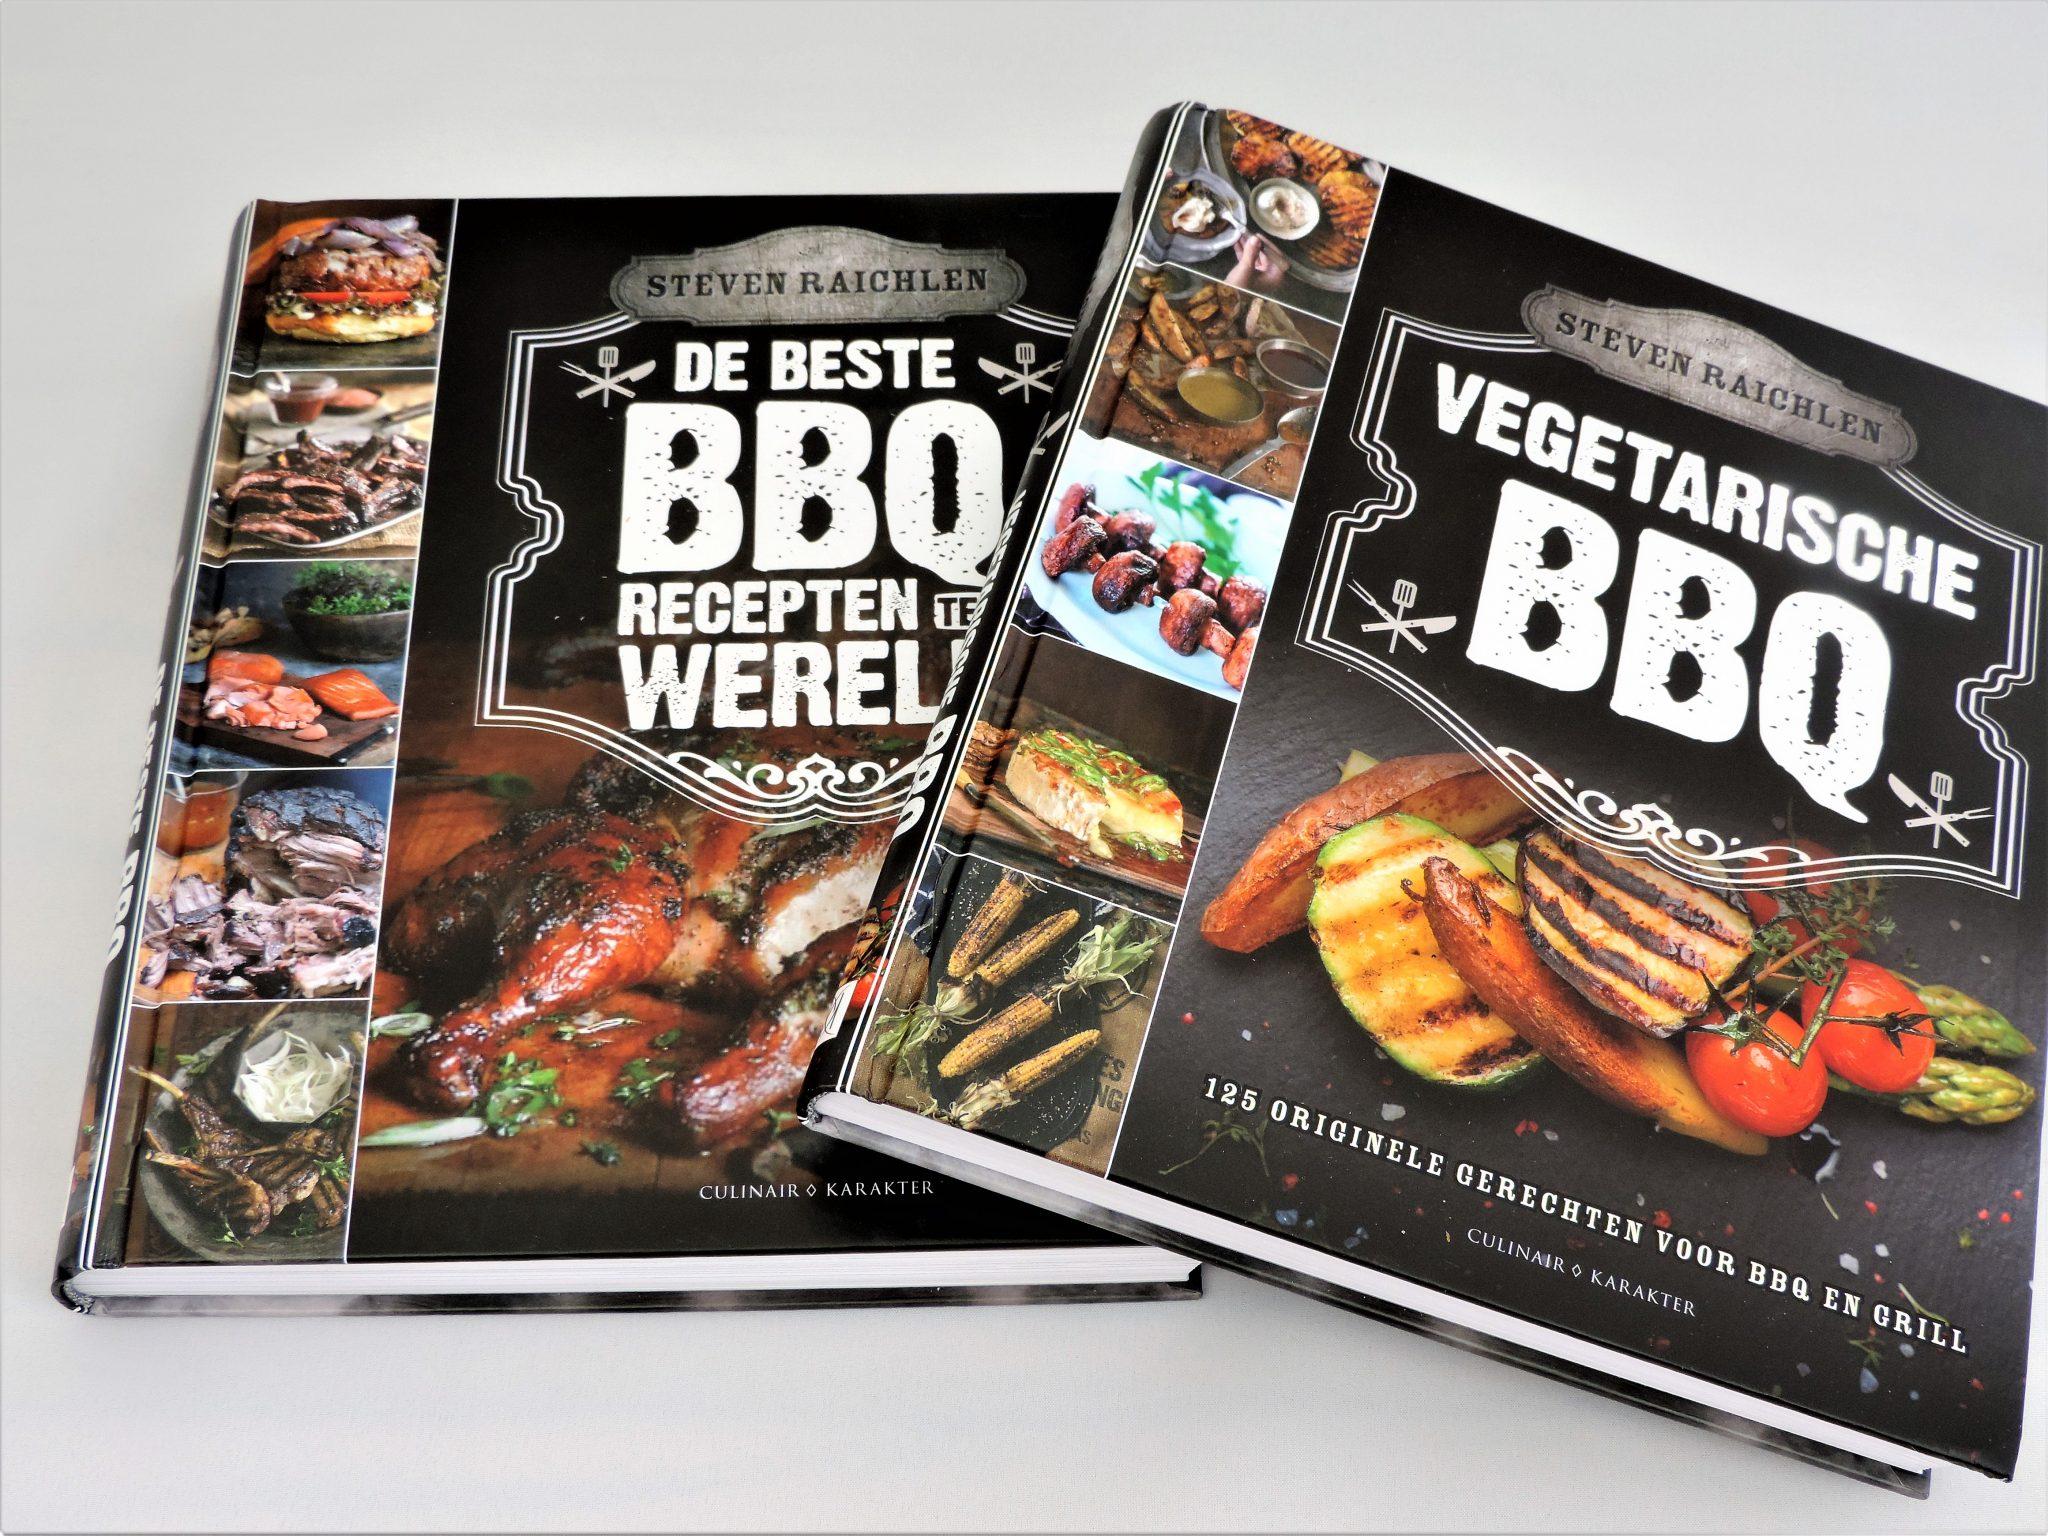 Steven Raichlen BBQ boeken